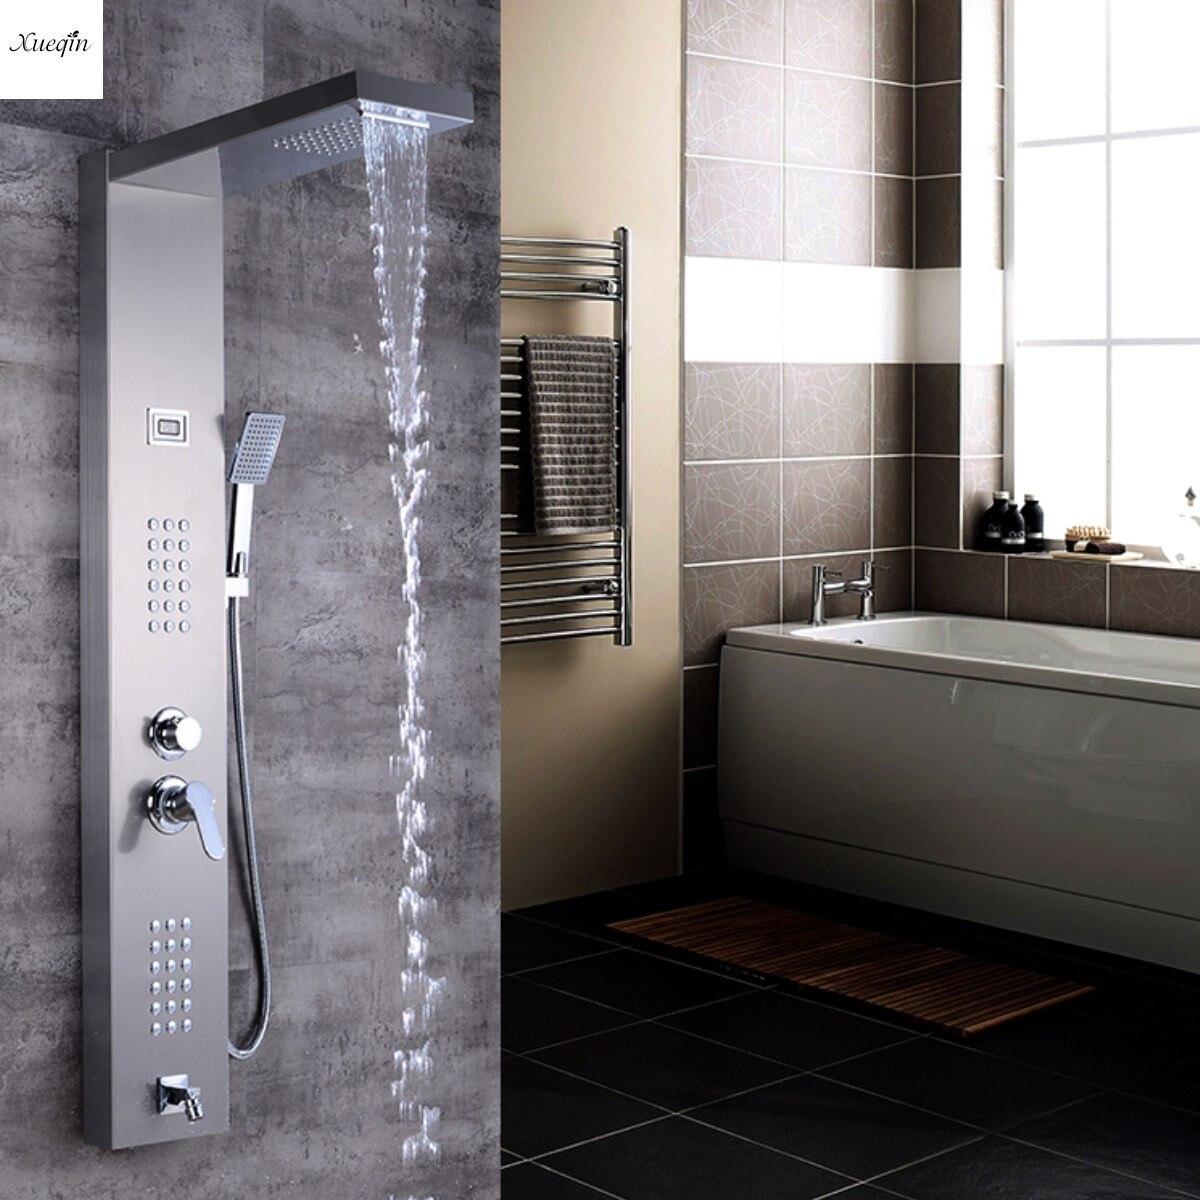 Brushed Nickel Finish Massage Jet Rainfall Shower Tower Bathroom ...